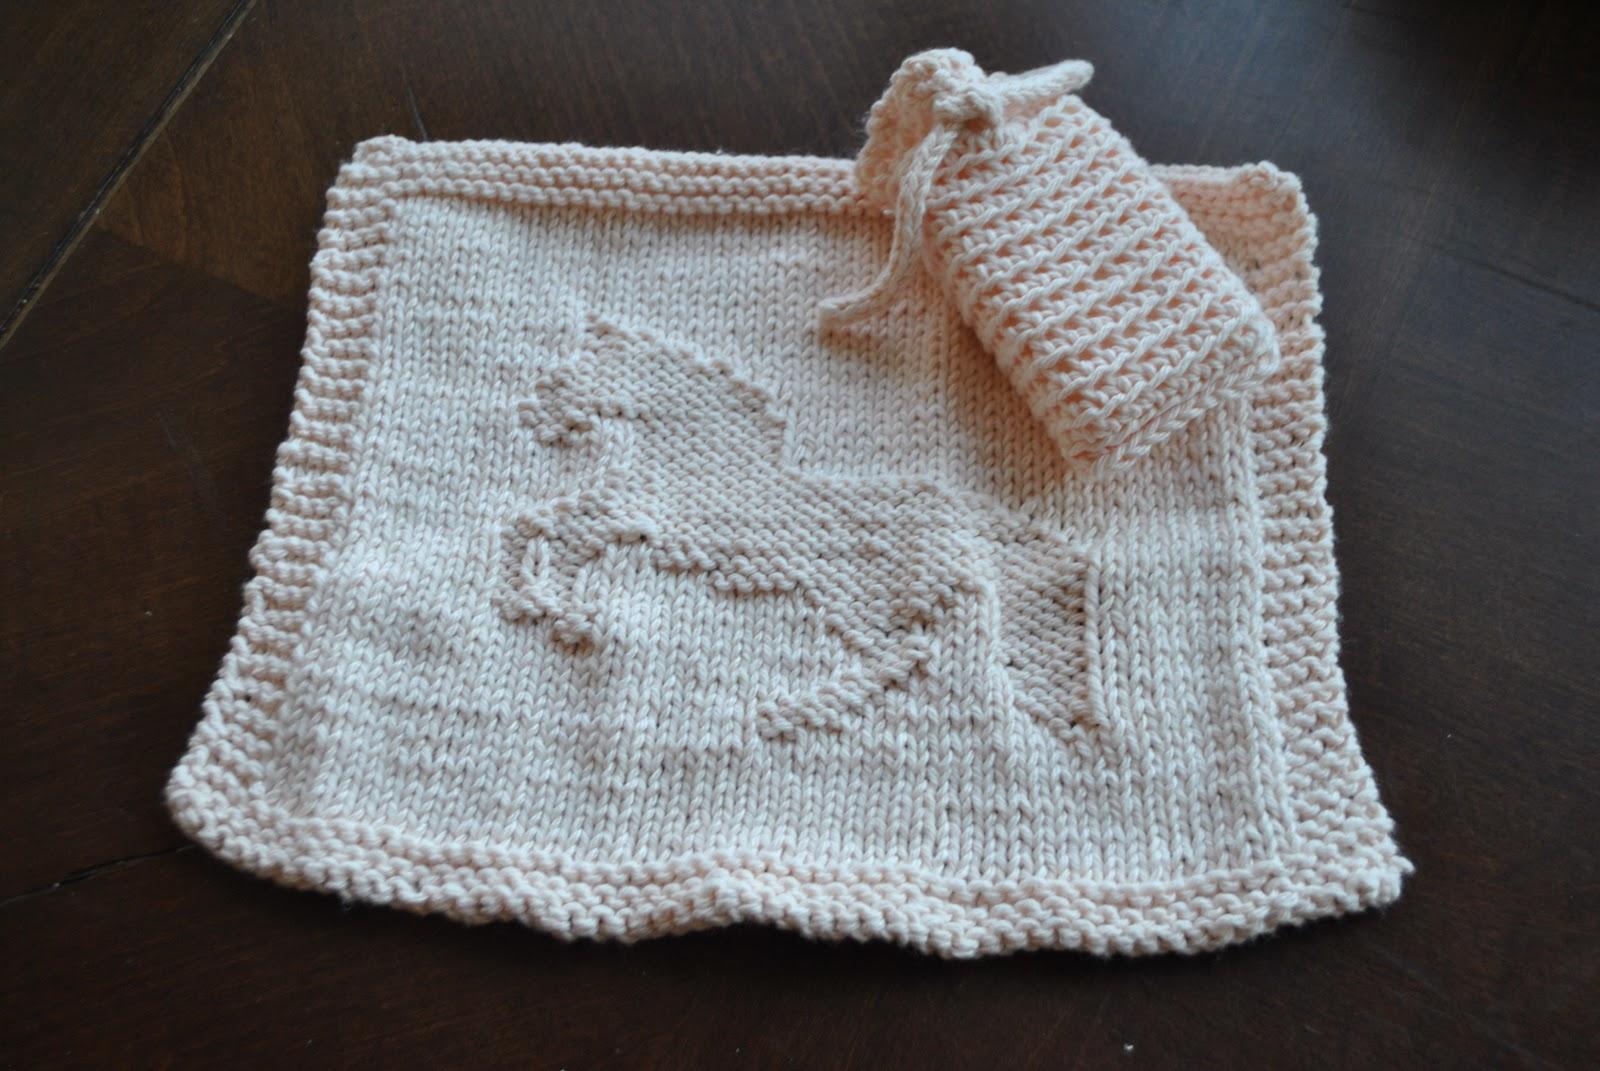 Westwood Manor: Yarn Along - Spa Crochet and Knit